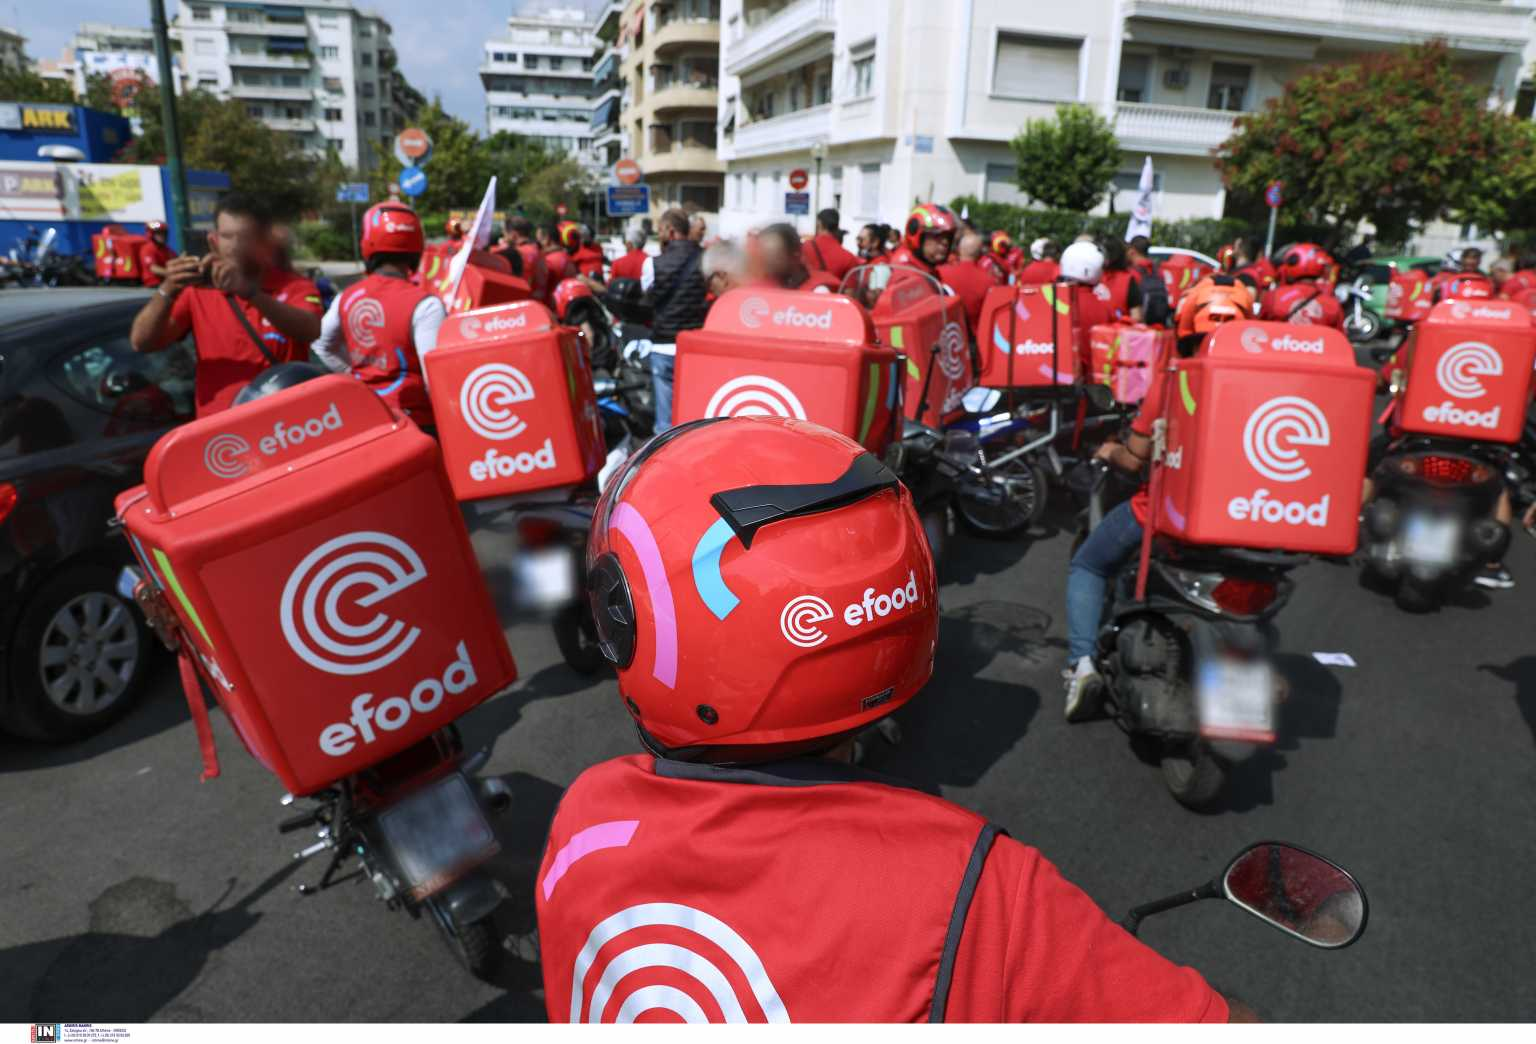 efood: Νέα απεργία των διανομέων την Παρασκευή – Επιστολή στον Κυριάκο Μητσοτάκη